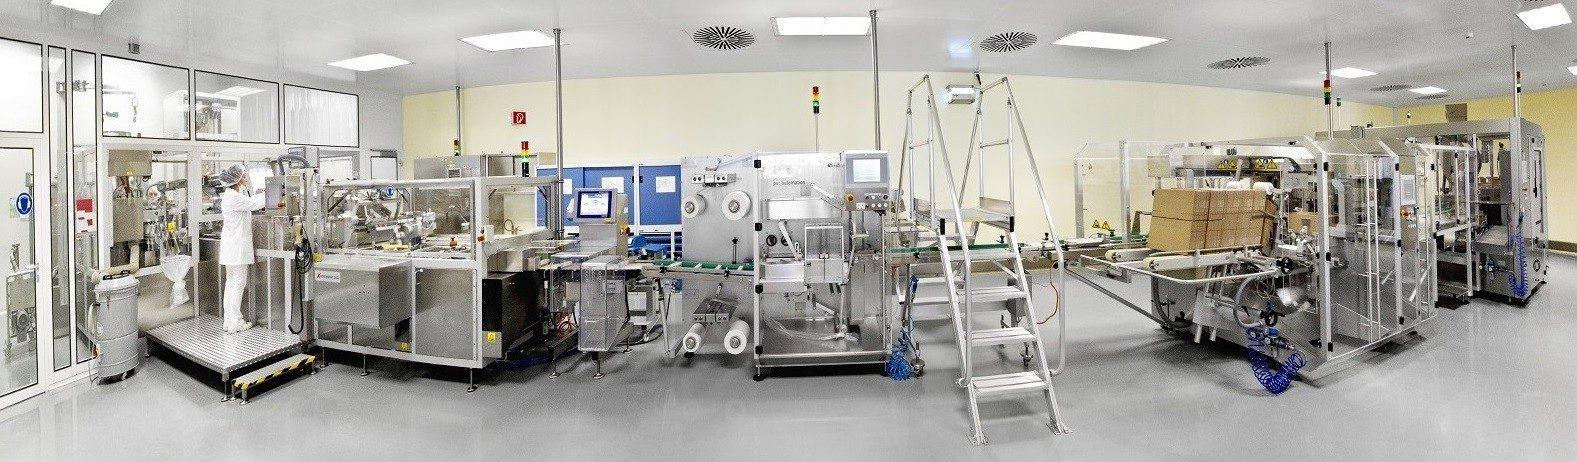 etol Pharma, Abfüllung, Lohnhersteller, Oral-Care-Produkte, Verpackung